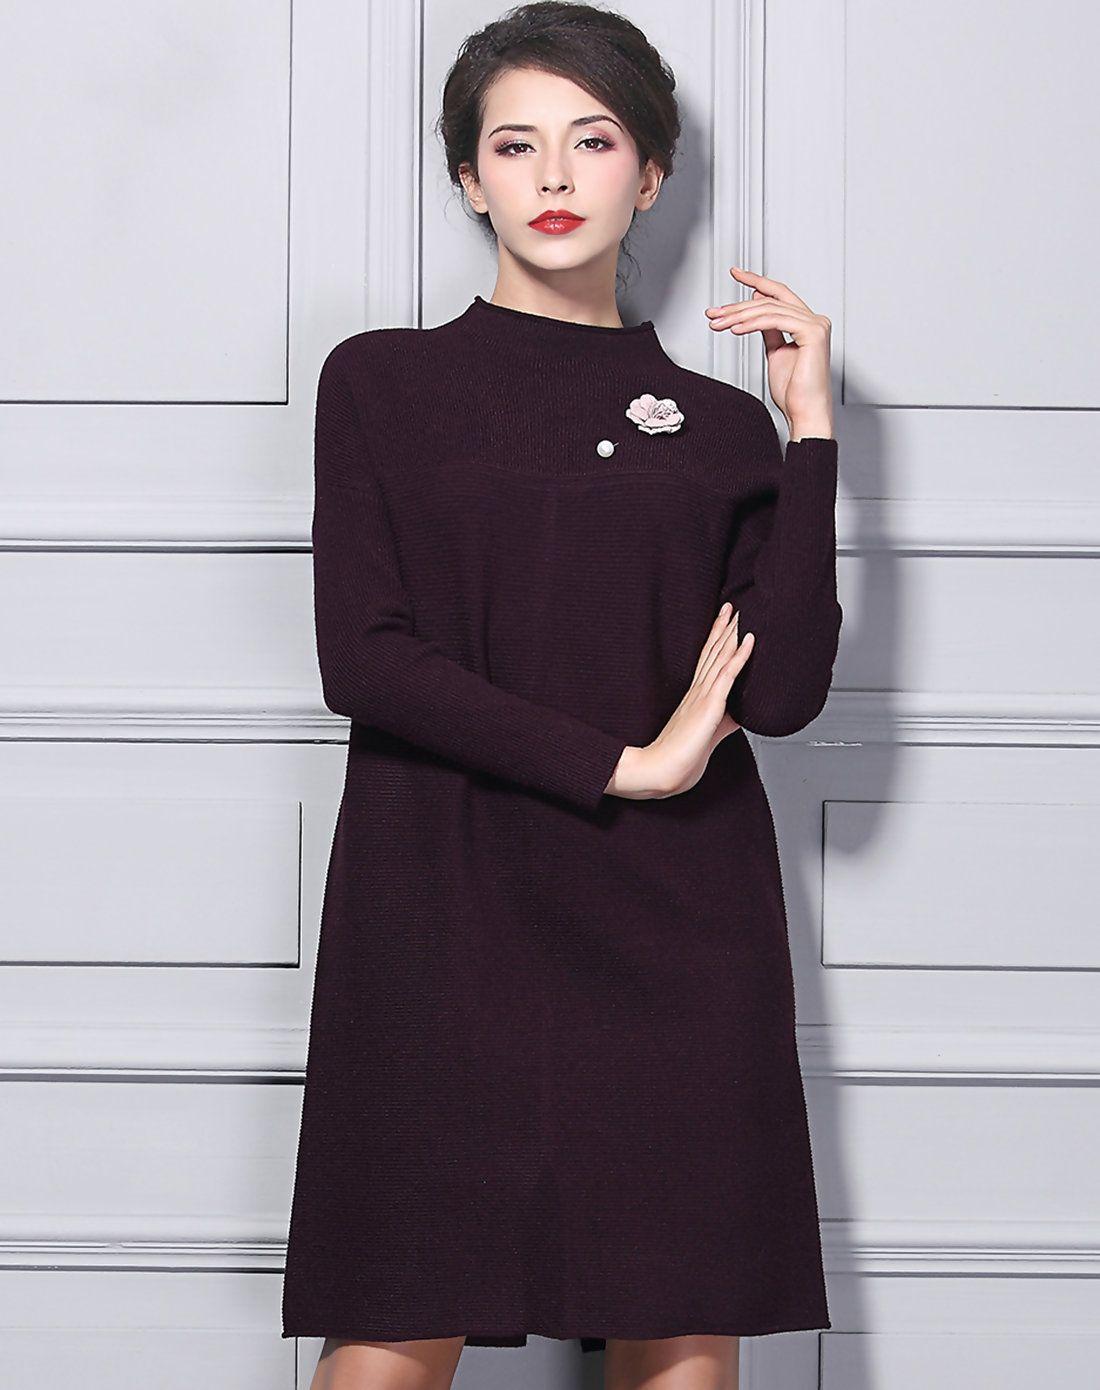 37a60d2b6294  AdoreWe BAOYAN Purple Stand Collar Shift Sweater Dress with Split -  AdoreWe.com